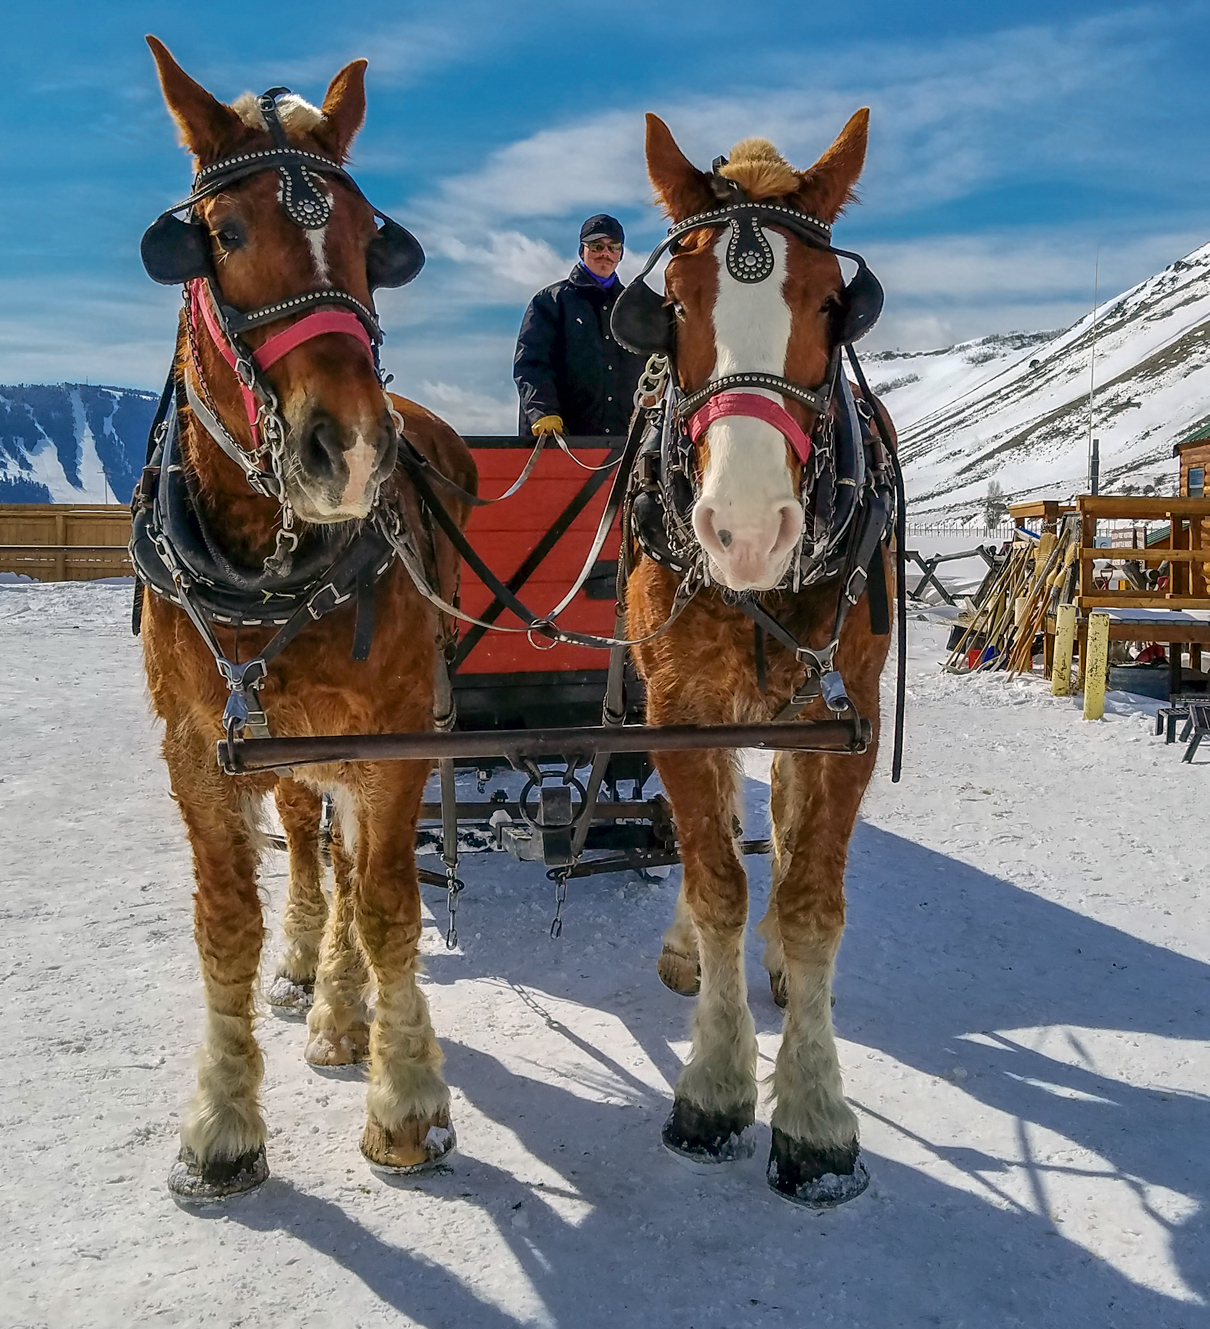 Horse drawn sleigh, National Elk Refuge, Wyoming